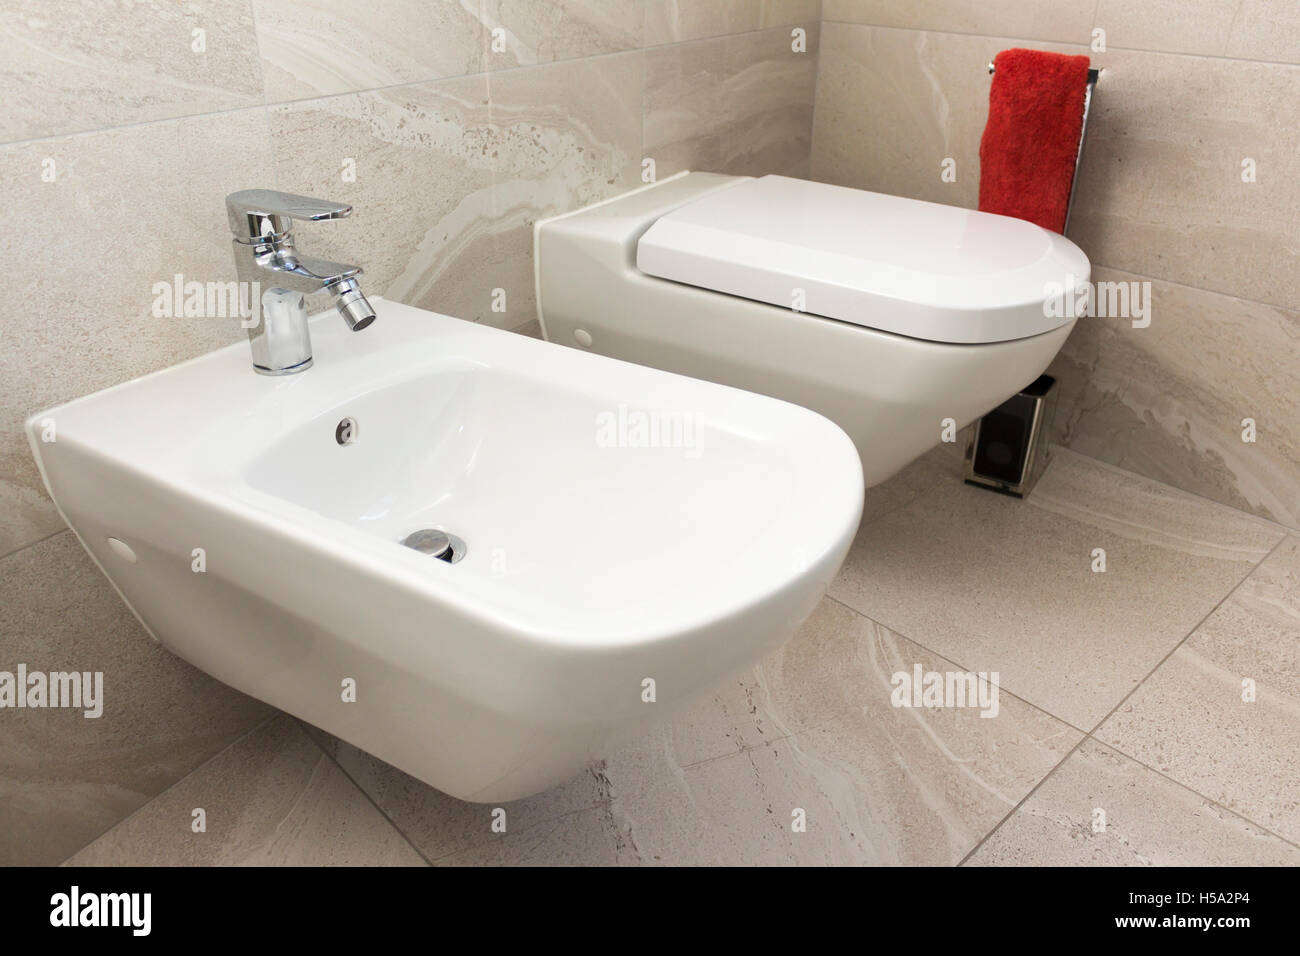 Modern Wc Bidet Bath Stock Photos & Modern Wc Bidet Bath Stock ...